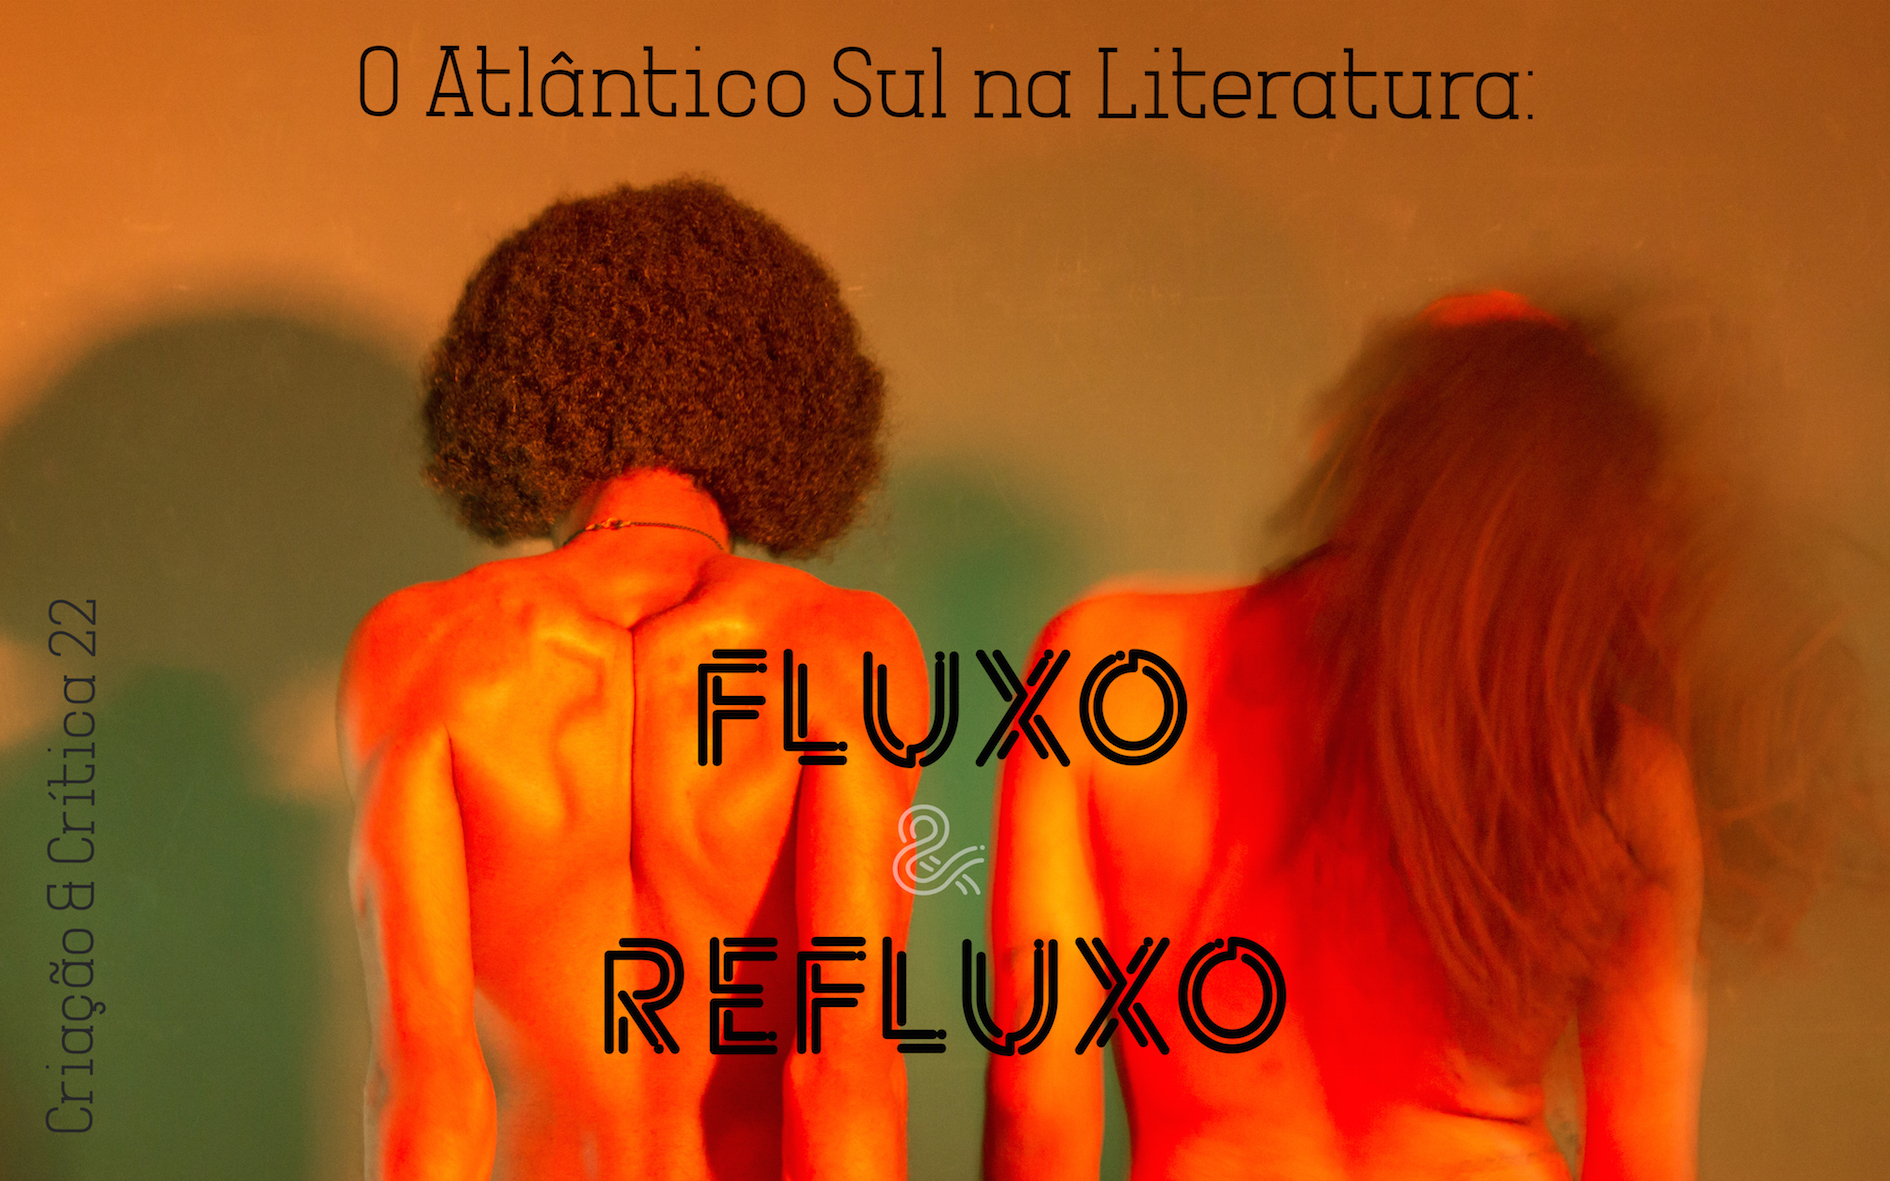 Visualizar n. 22 (2018): O Atlântico Sul na Literatura: Fluxo e Refluxo